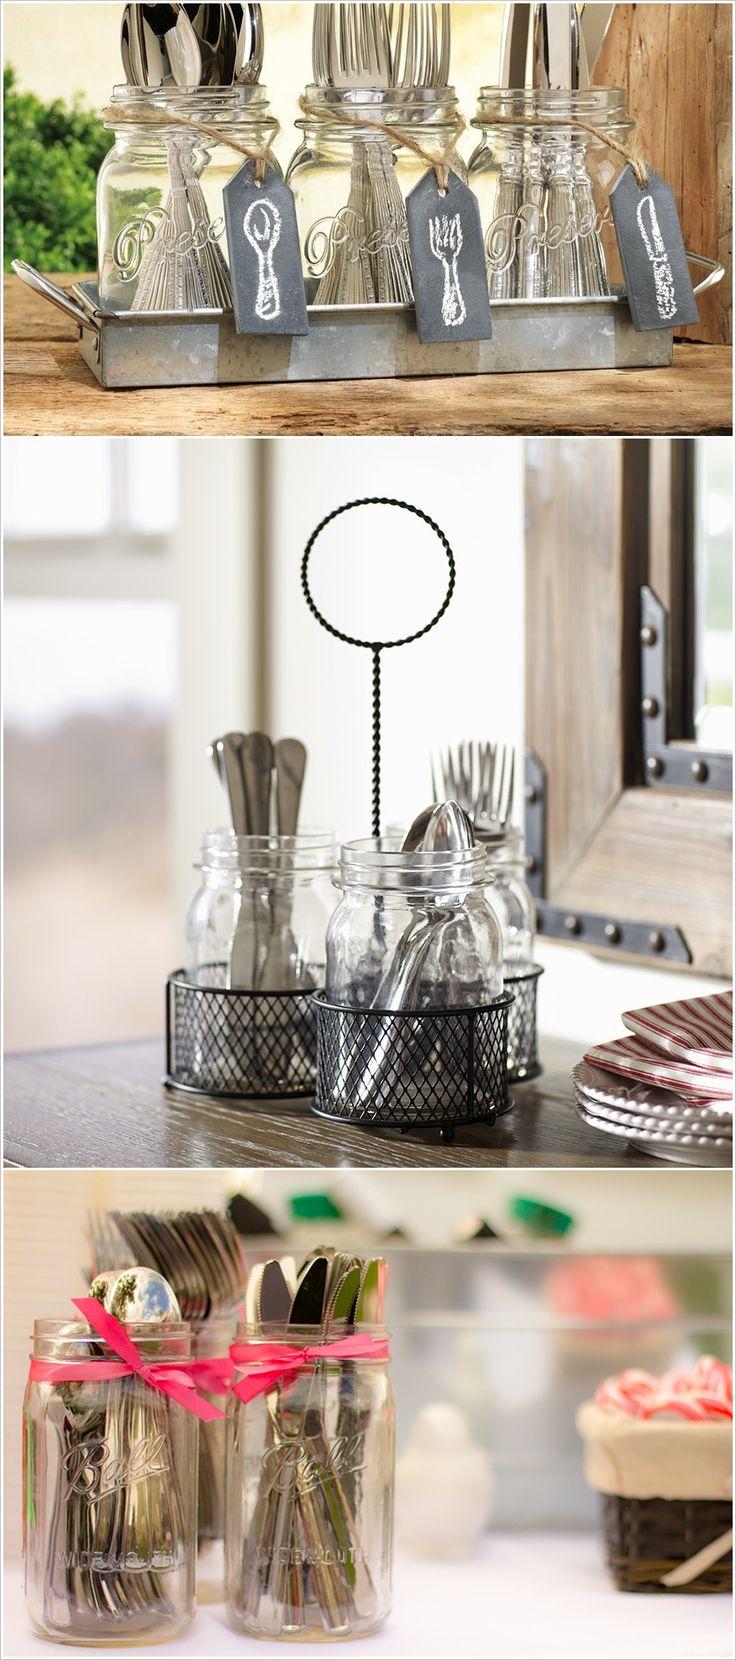 10 Cutlery Storage Ideas For Your Kitchen